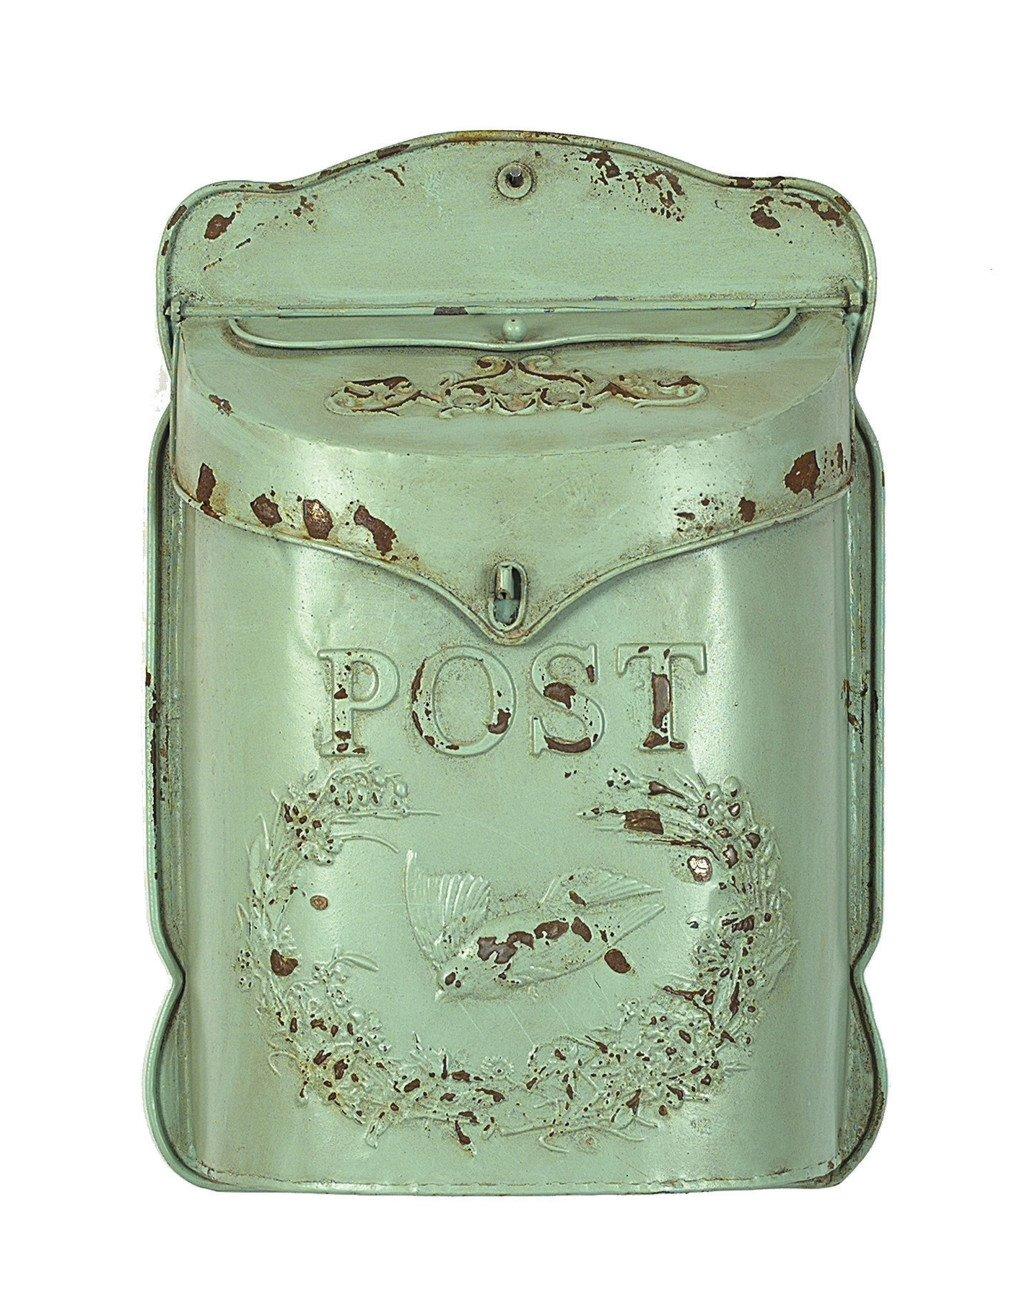 Aqua Embossed Tin Post Box with Distressed Finish